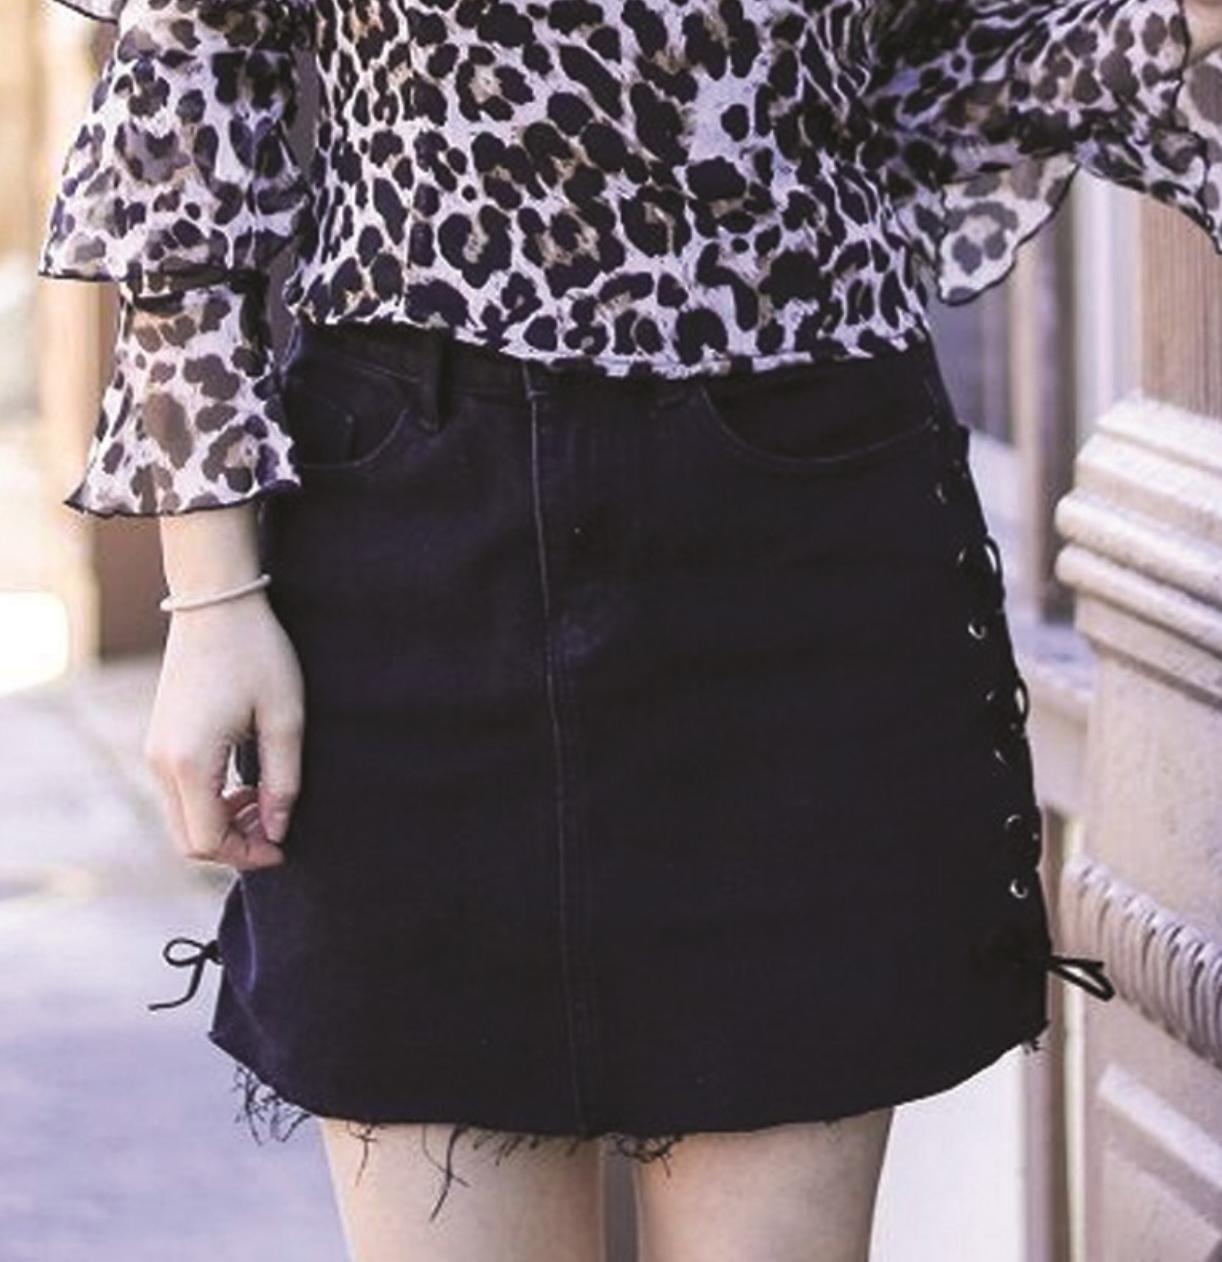 b740236d2b Black Denim Skirt with Laces on Side - TheBlingBoxOnline.com